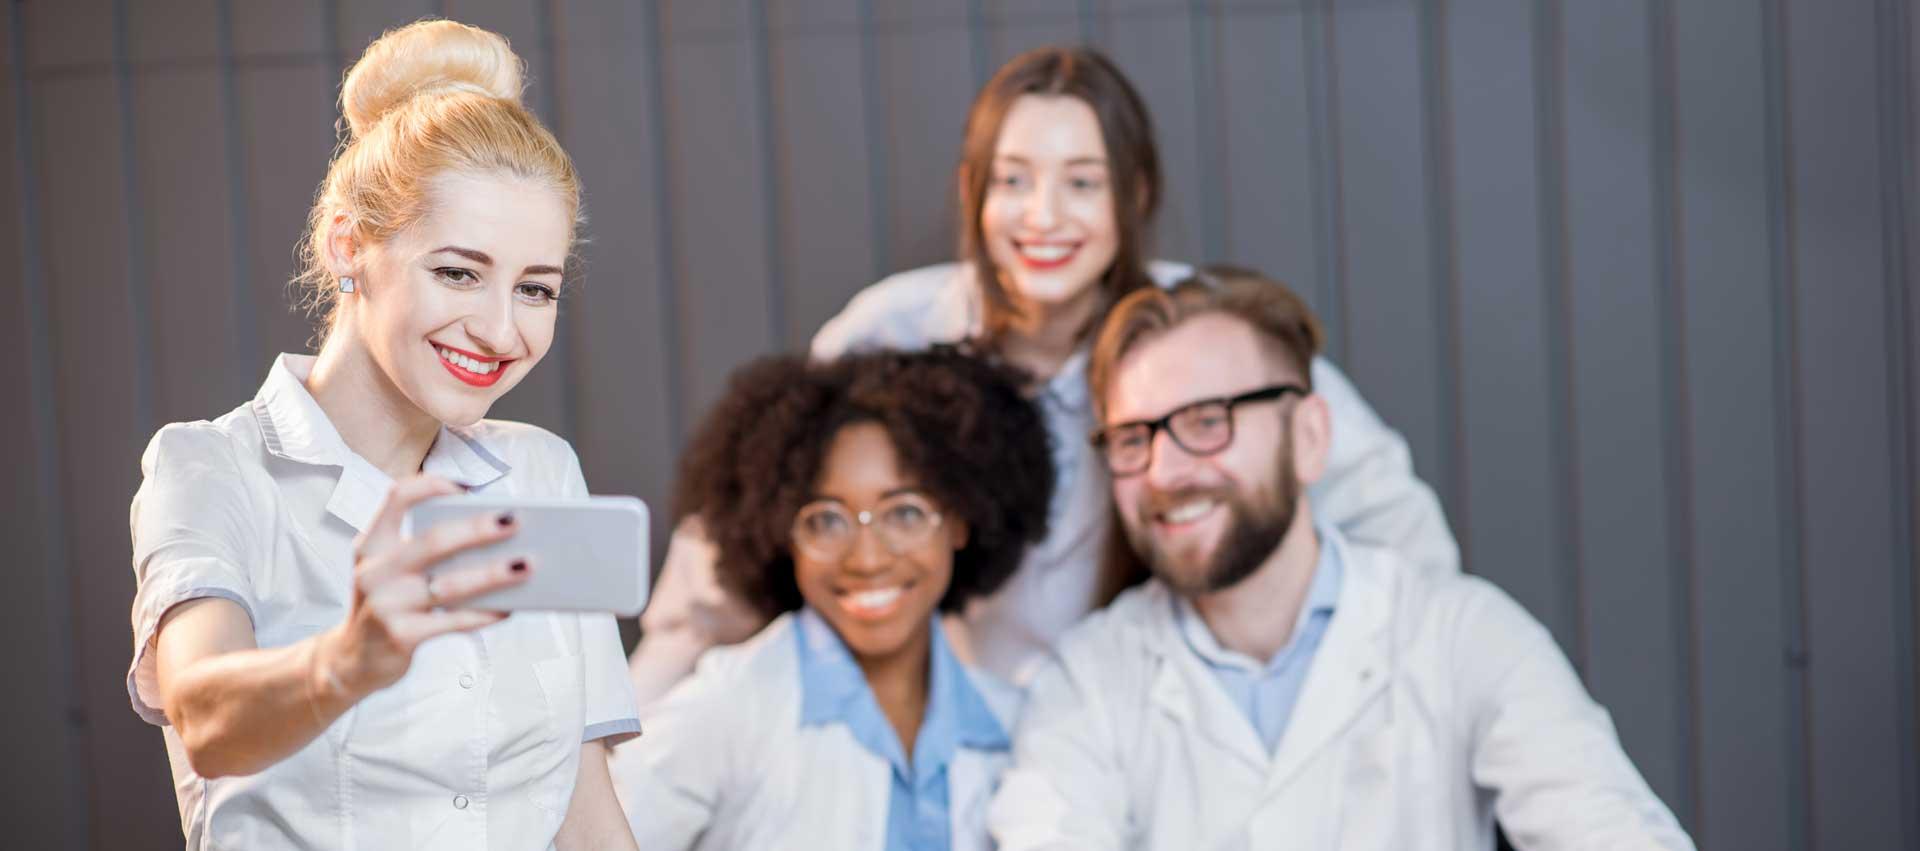 Bandeau-Medecine-Vie étudiante